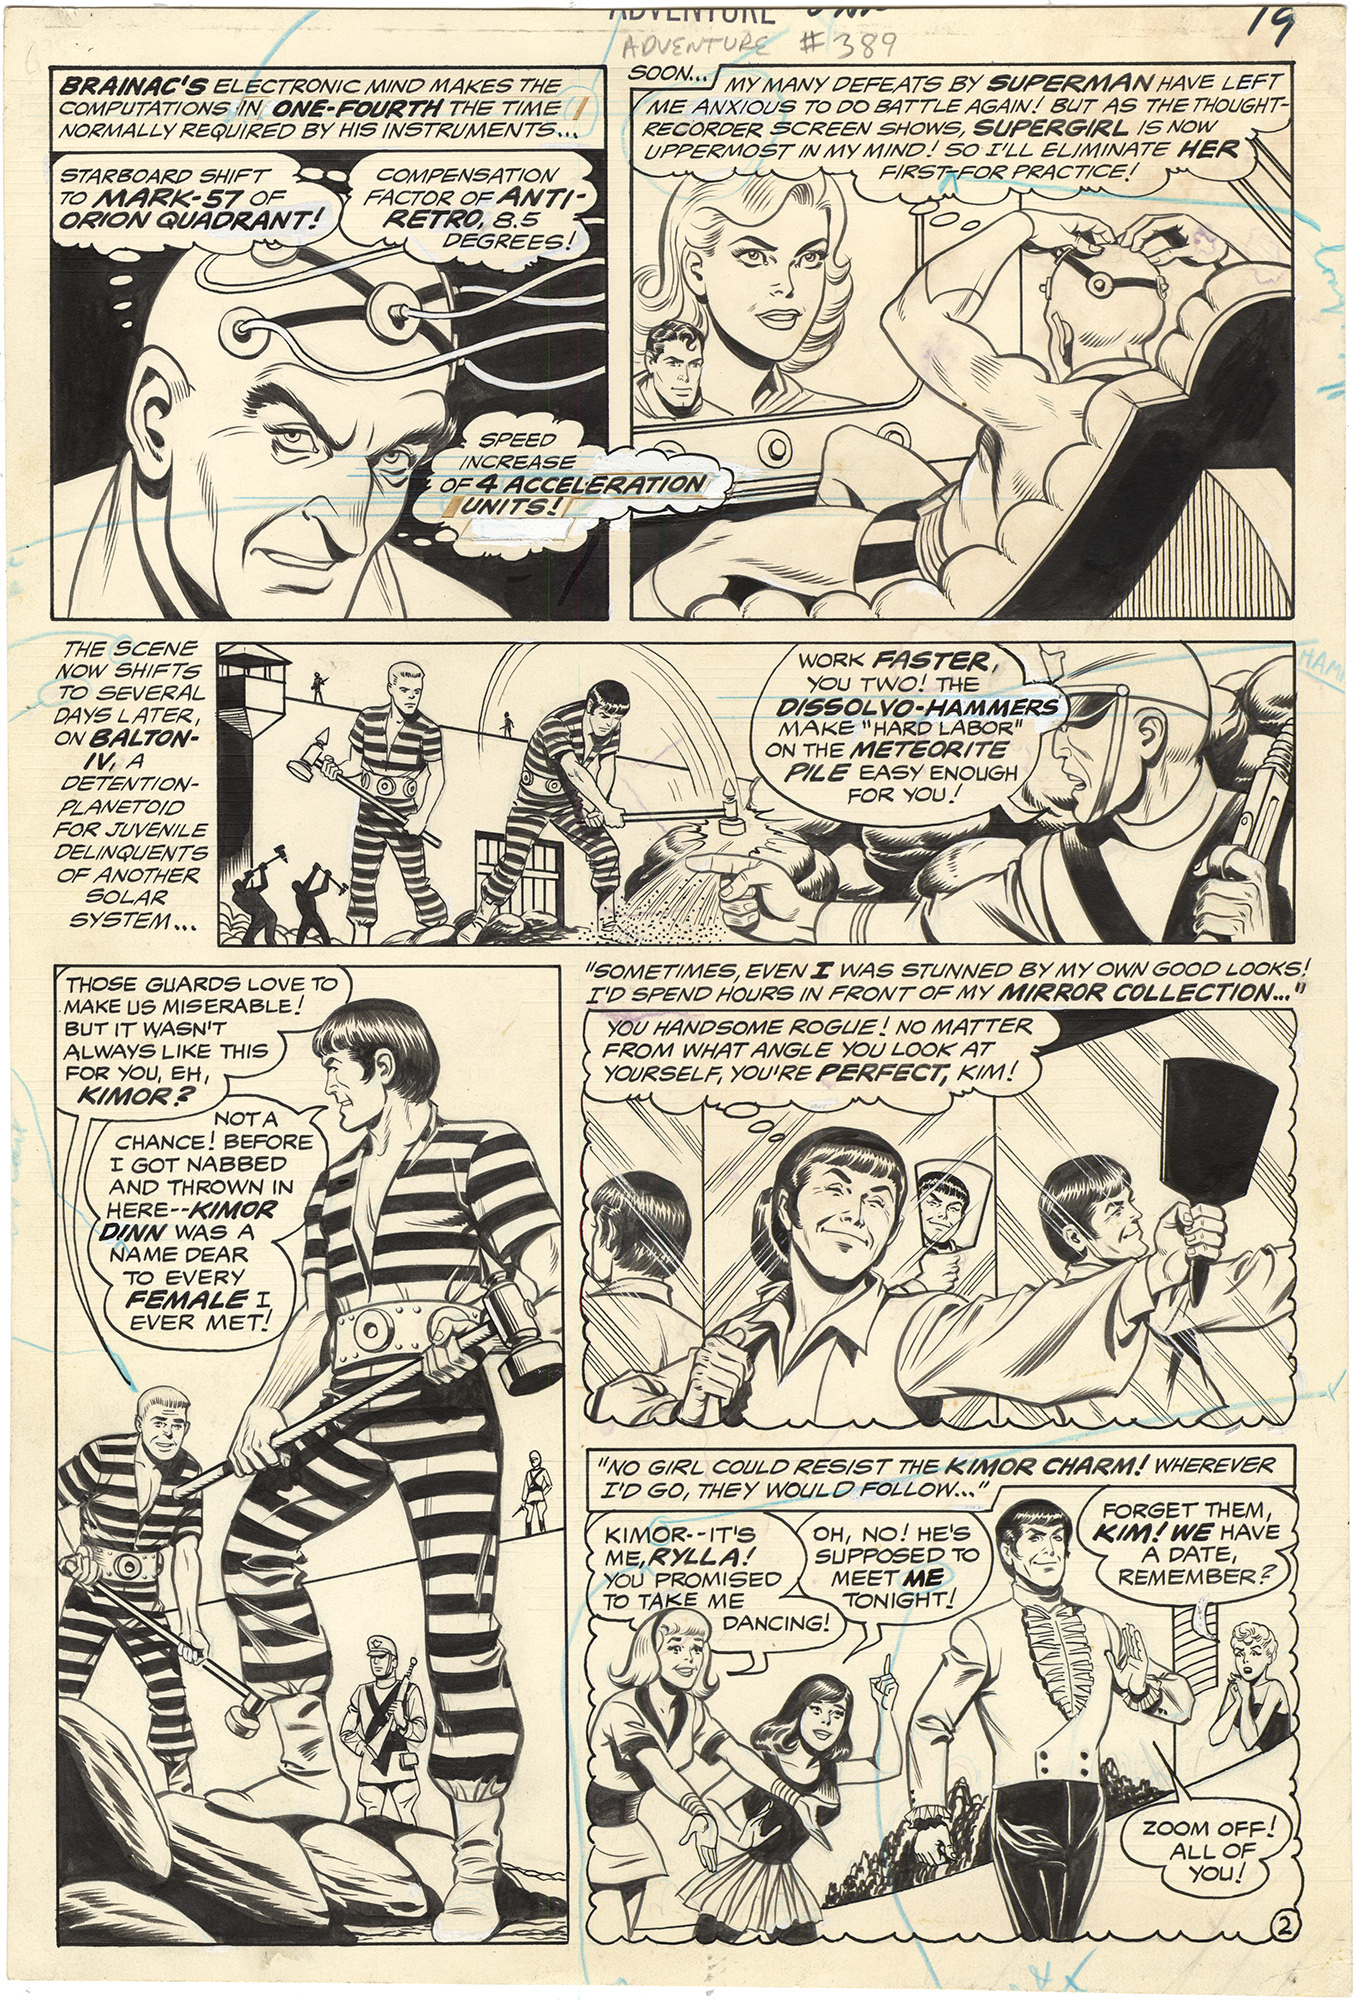 Adventure Comics #389 p2